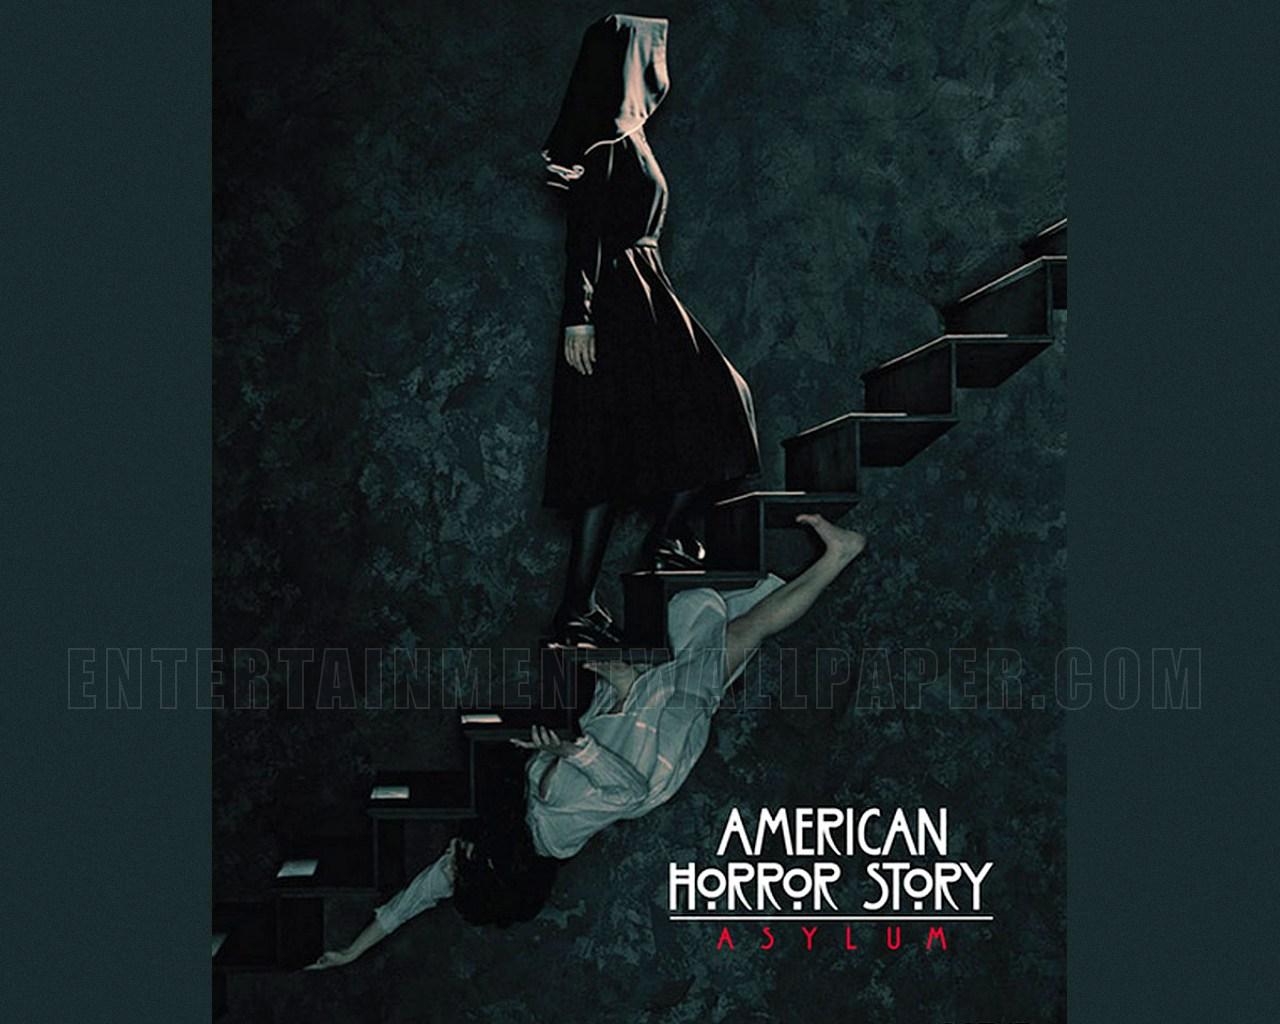 American Horror Story Wallpaper American Horror Story Wallpaper